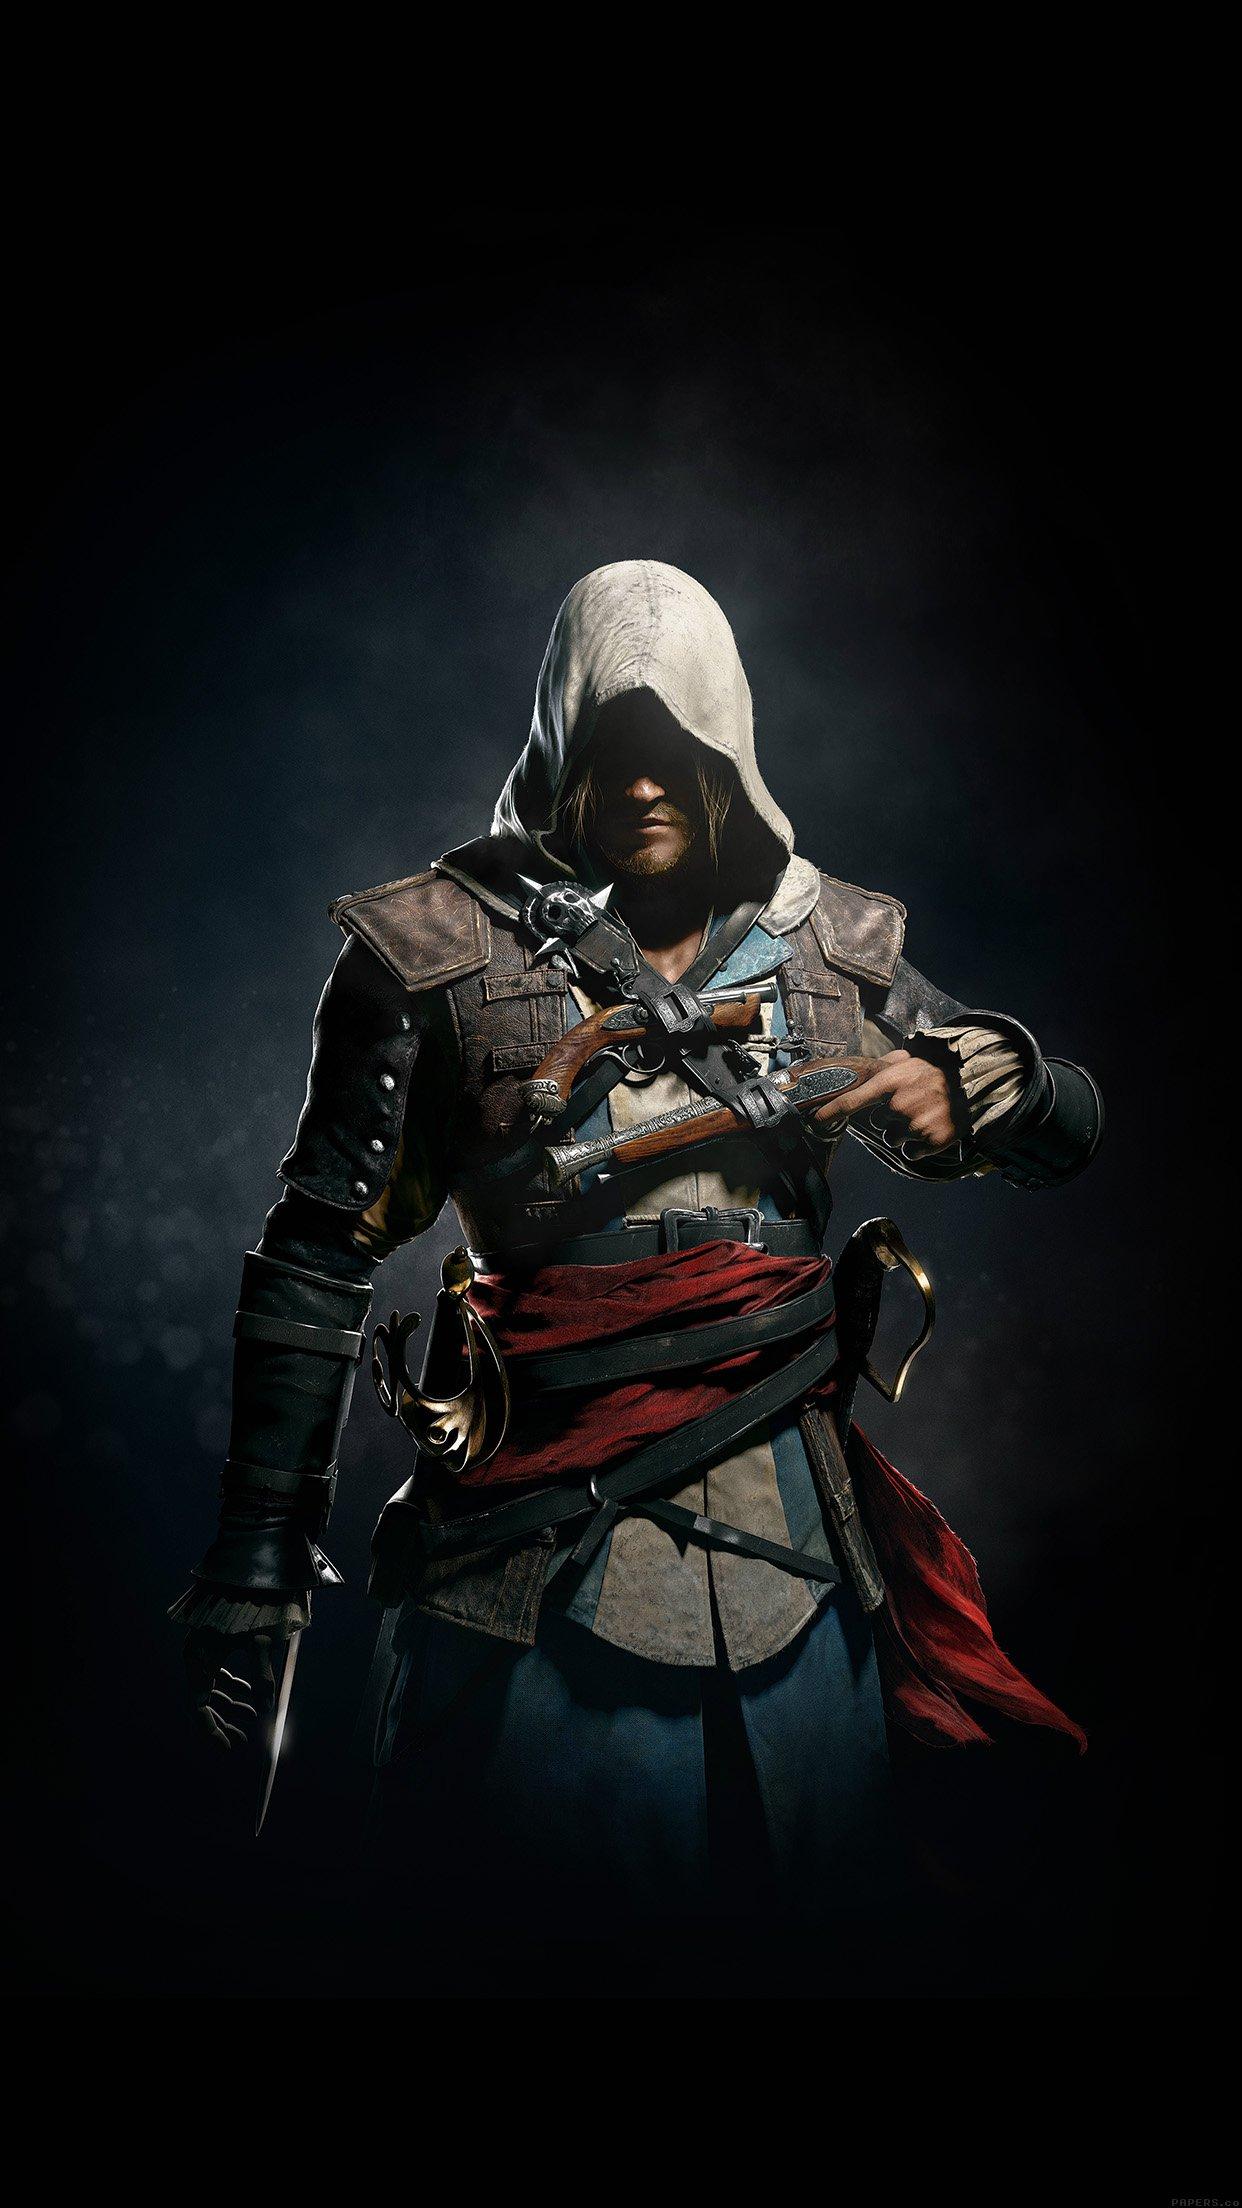 Assassins Creed 4 Dark Game Art Illust